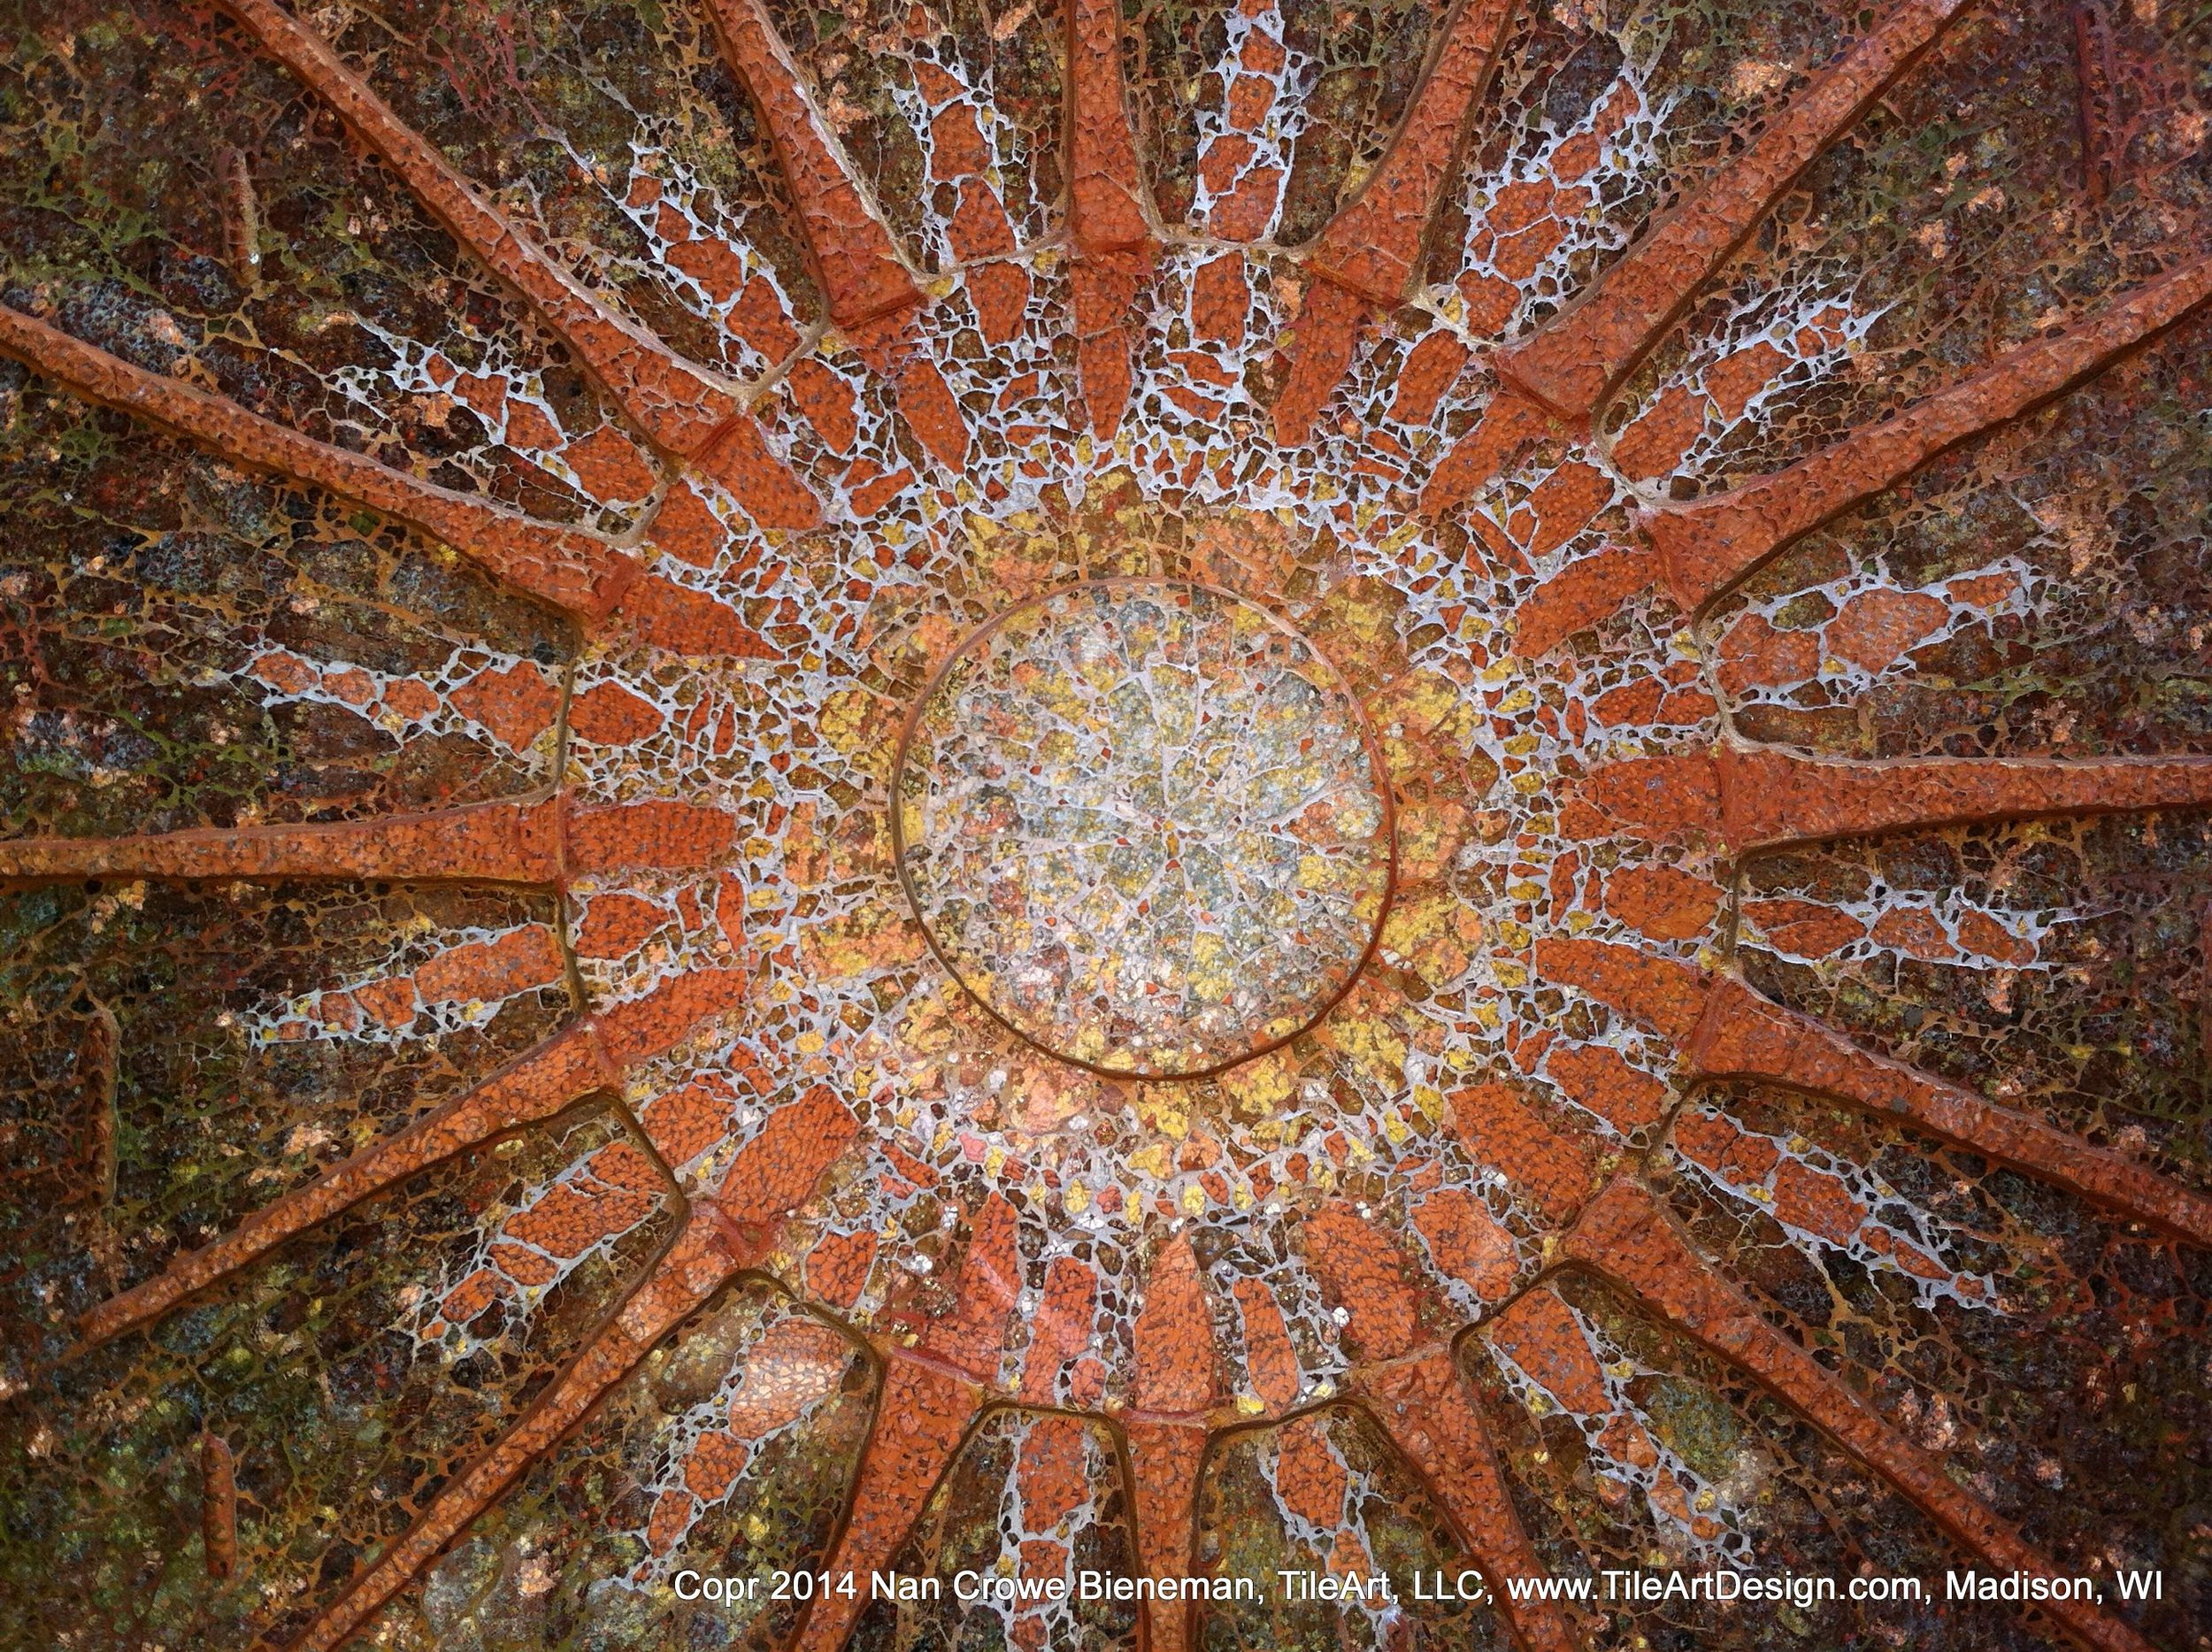 006-detail of mosaic center_1835.jpg